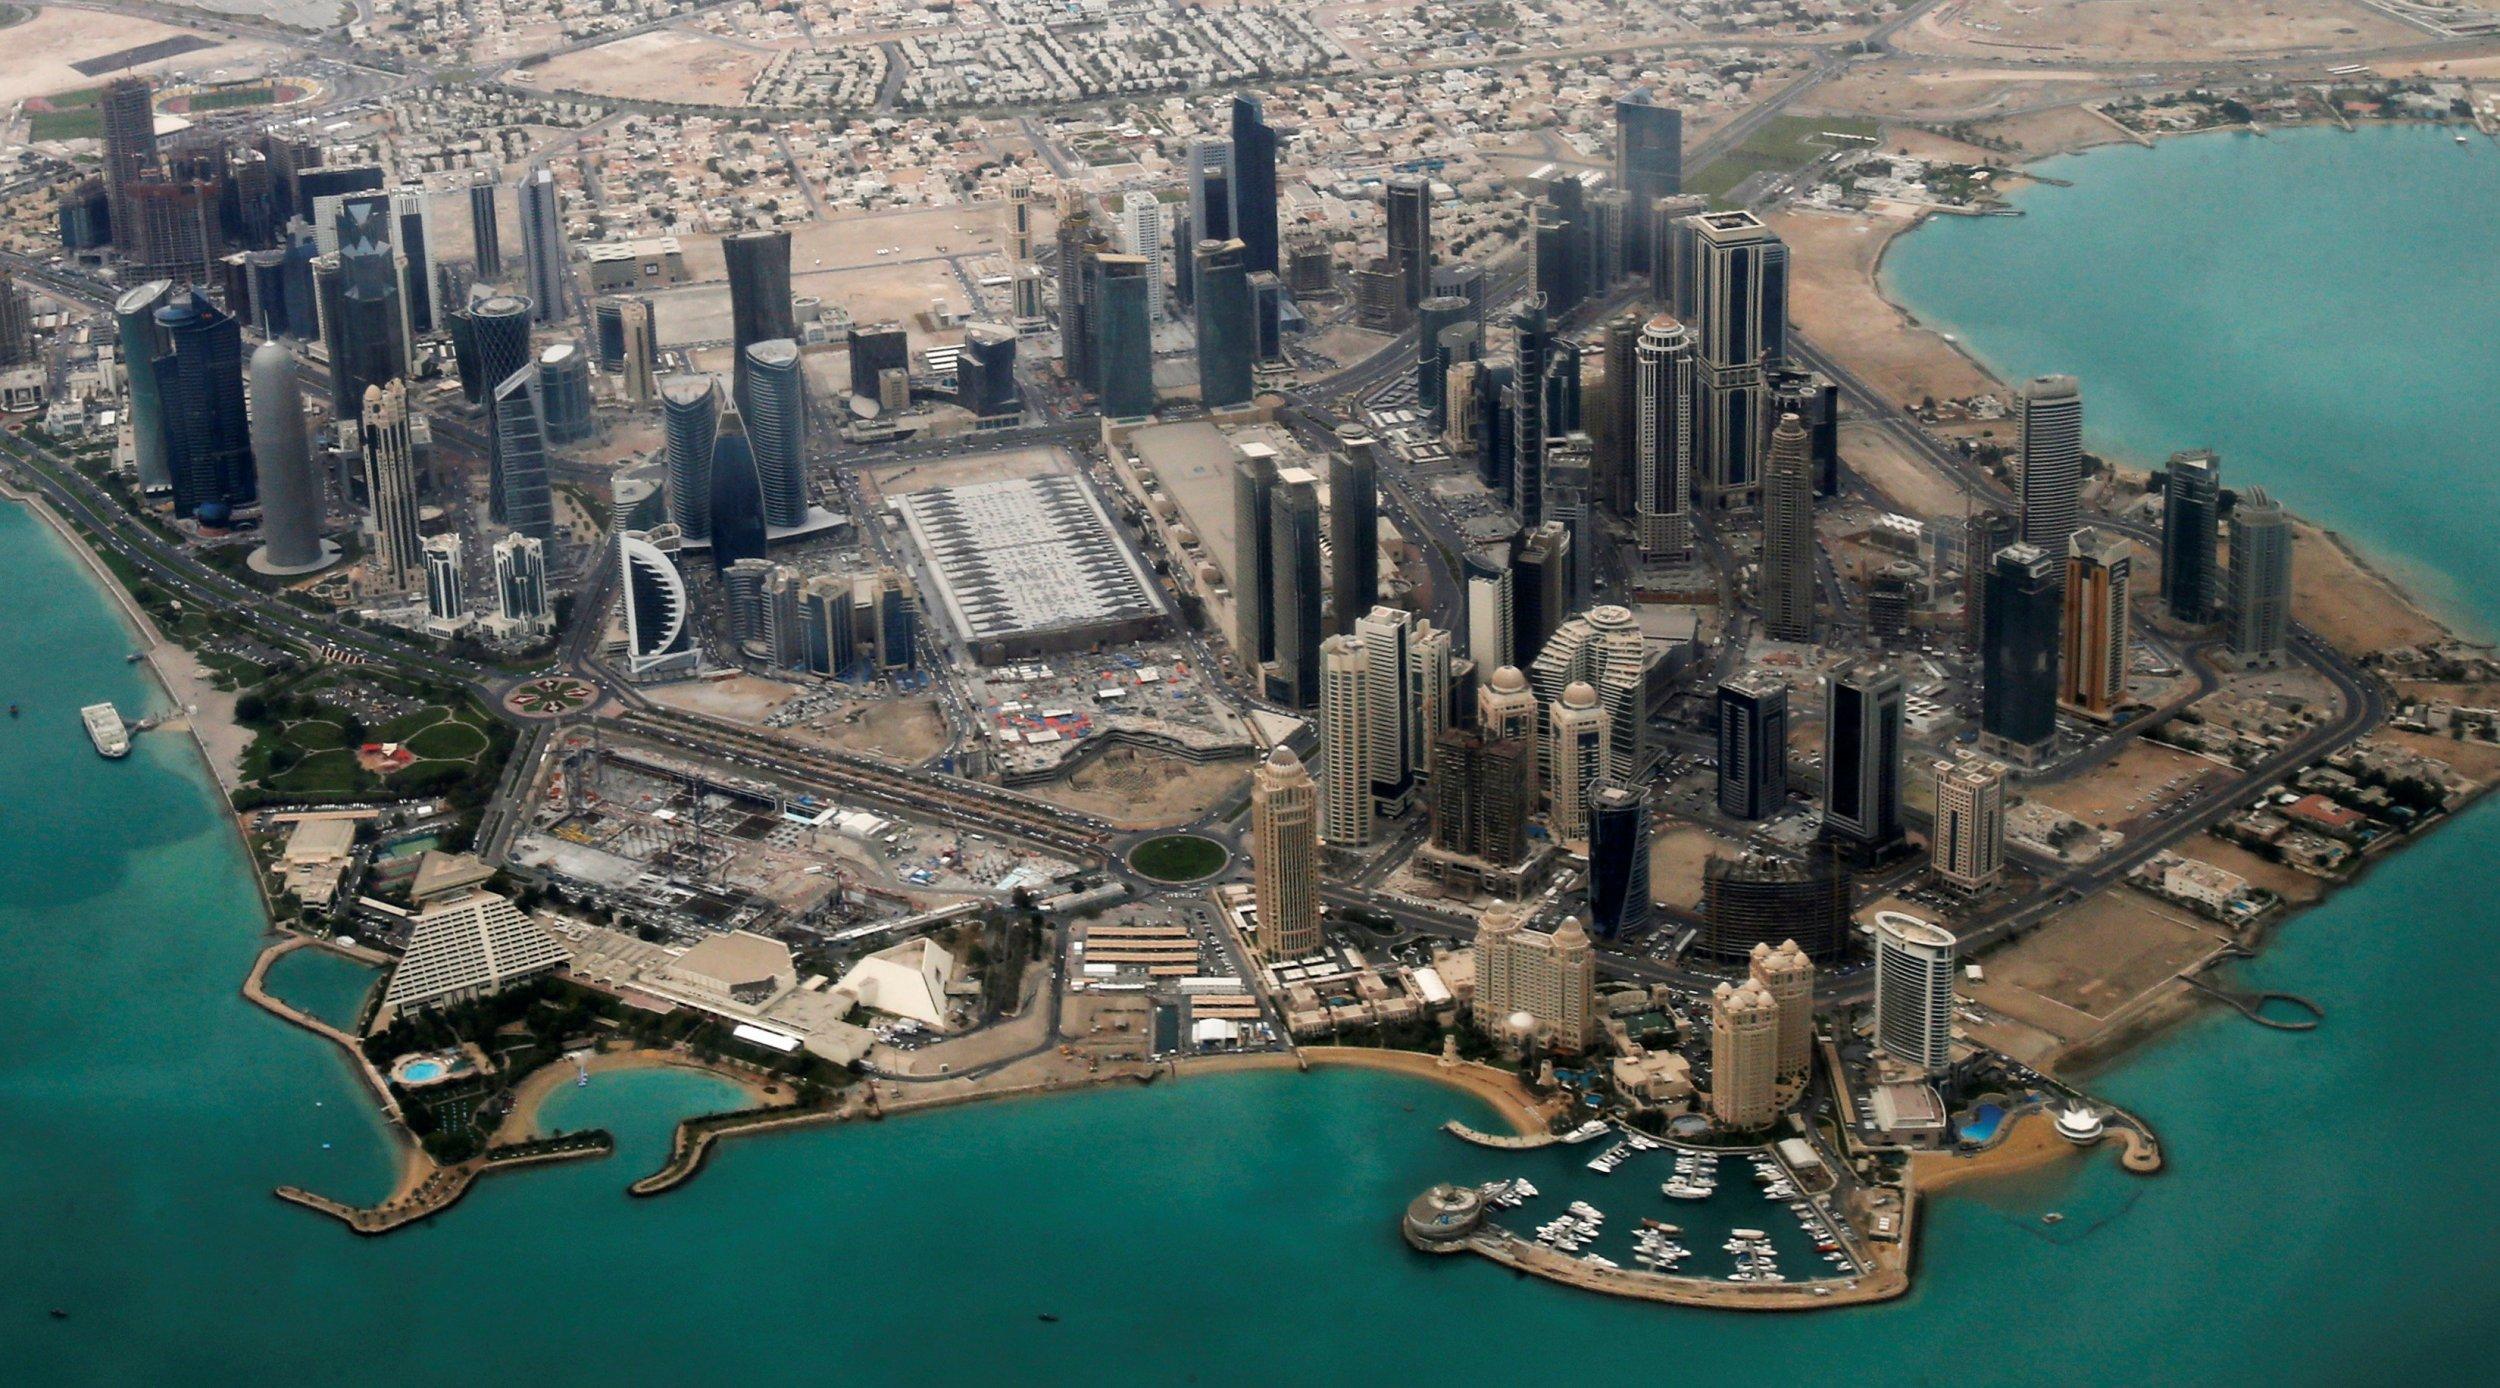 06_11_qatar_04